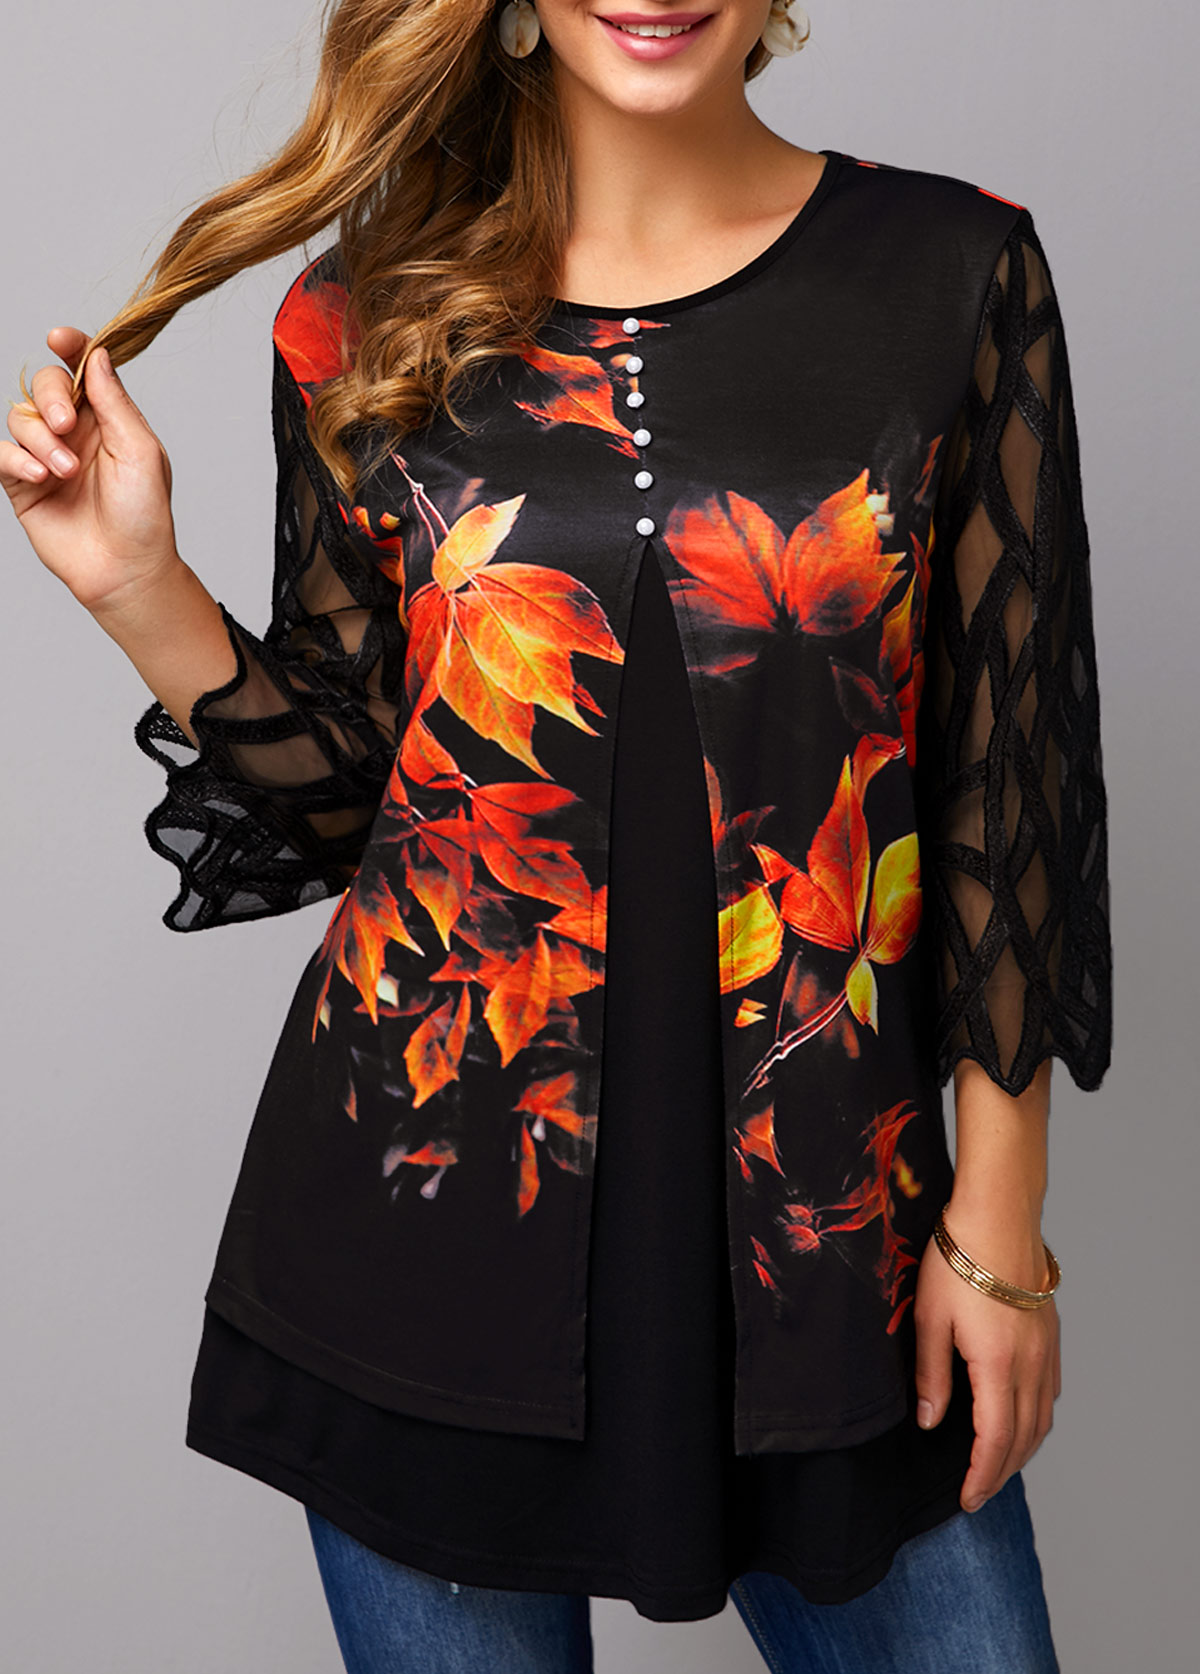 ROTITA Maple Leaf Print Faux Two Piece T Shirt